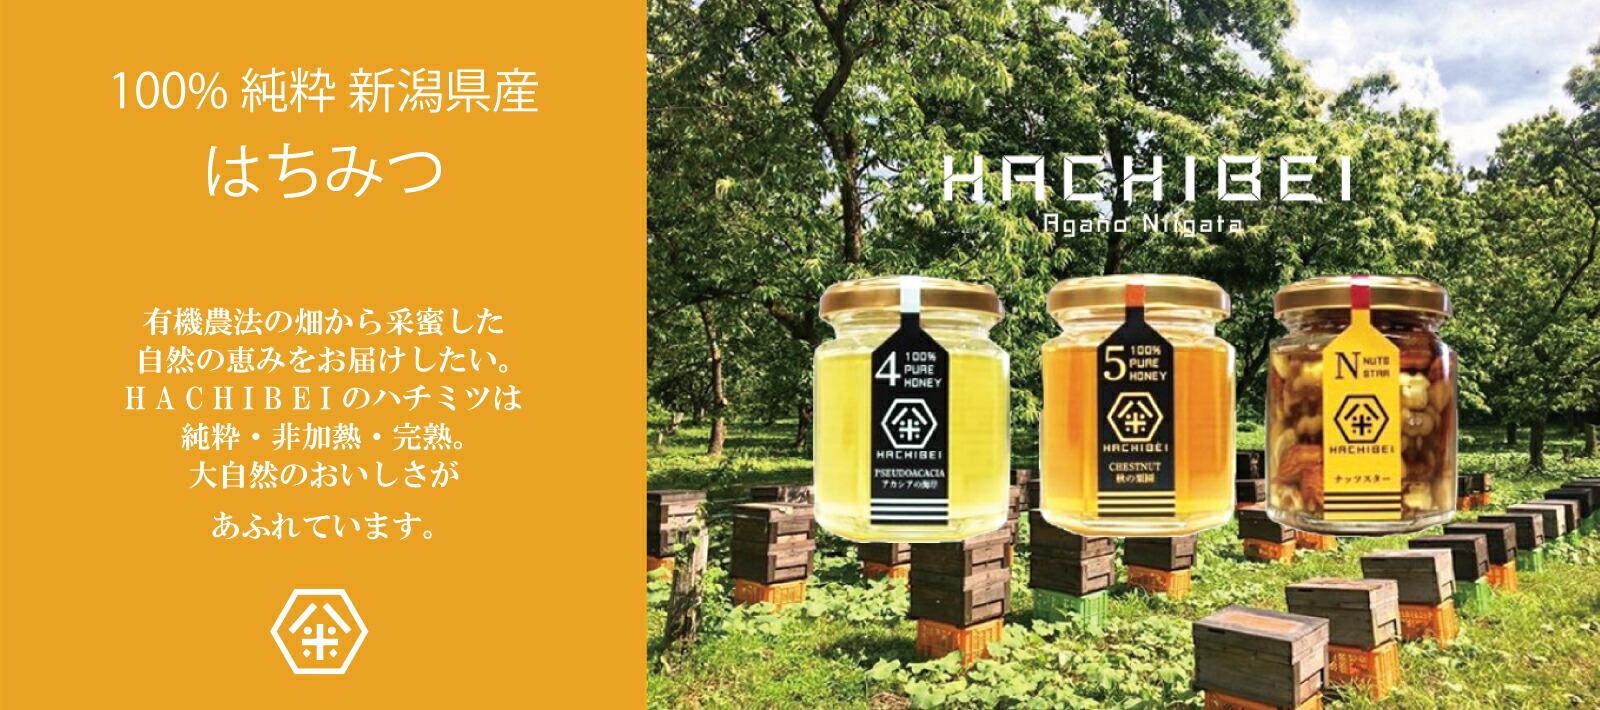 hachibei(ハチベイ)